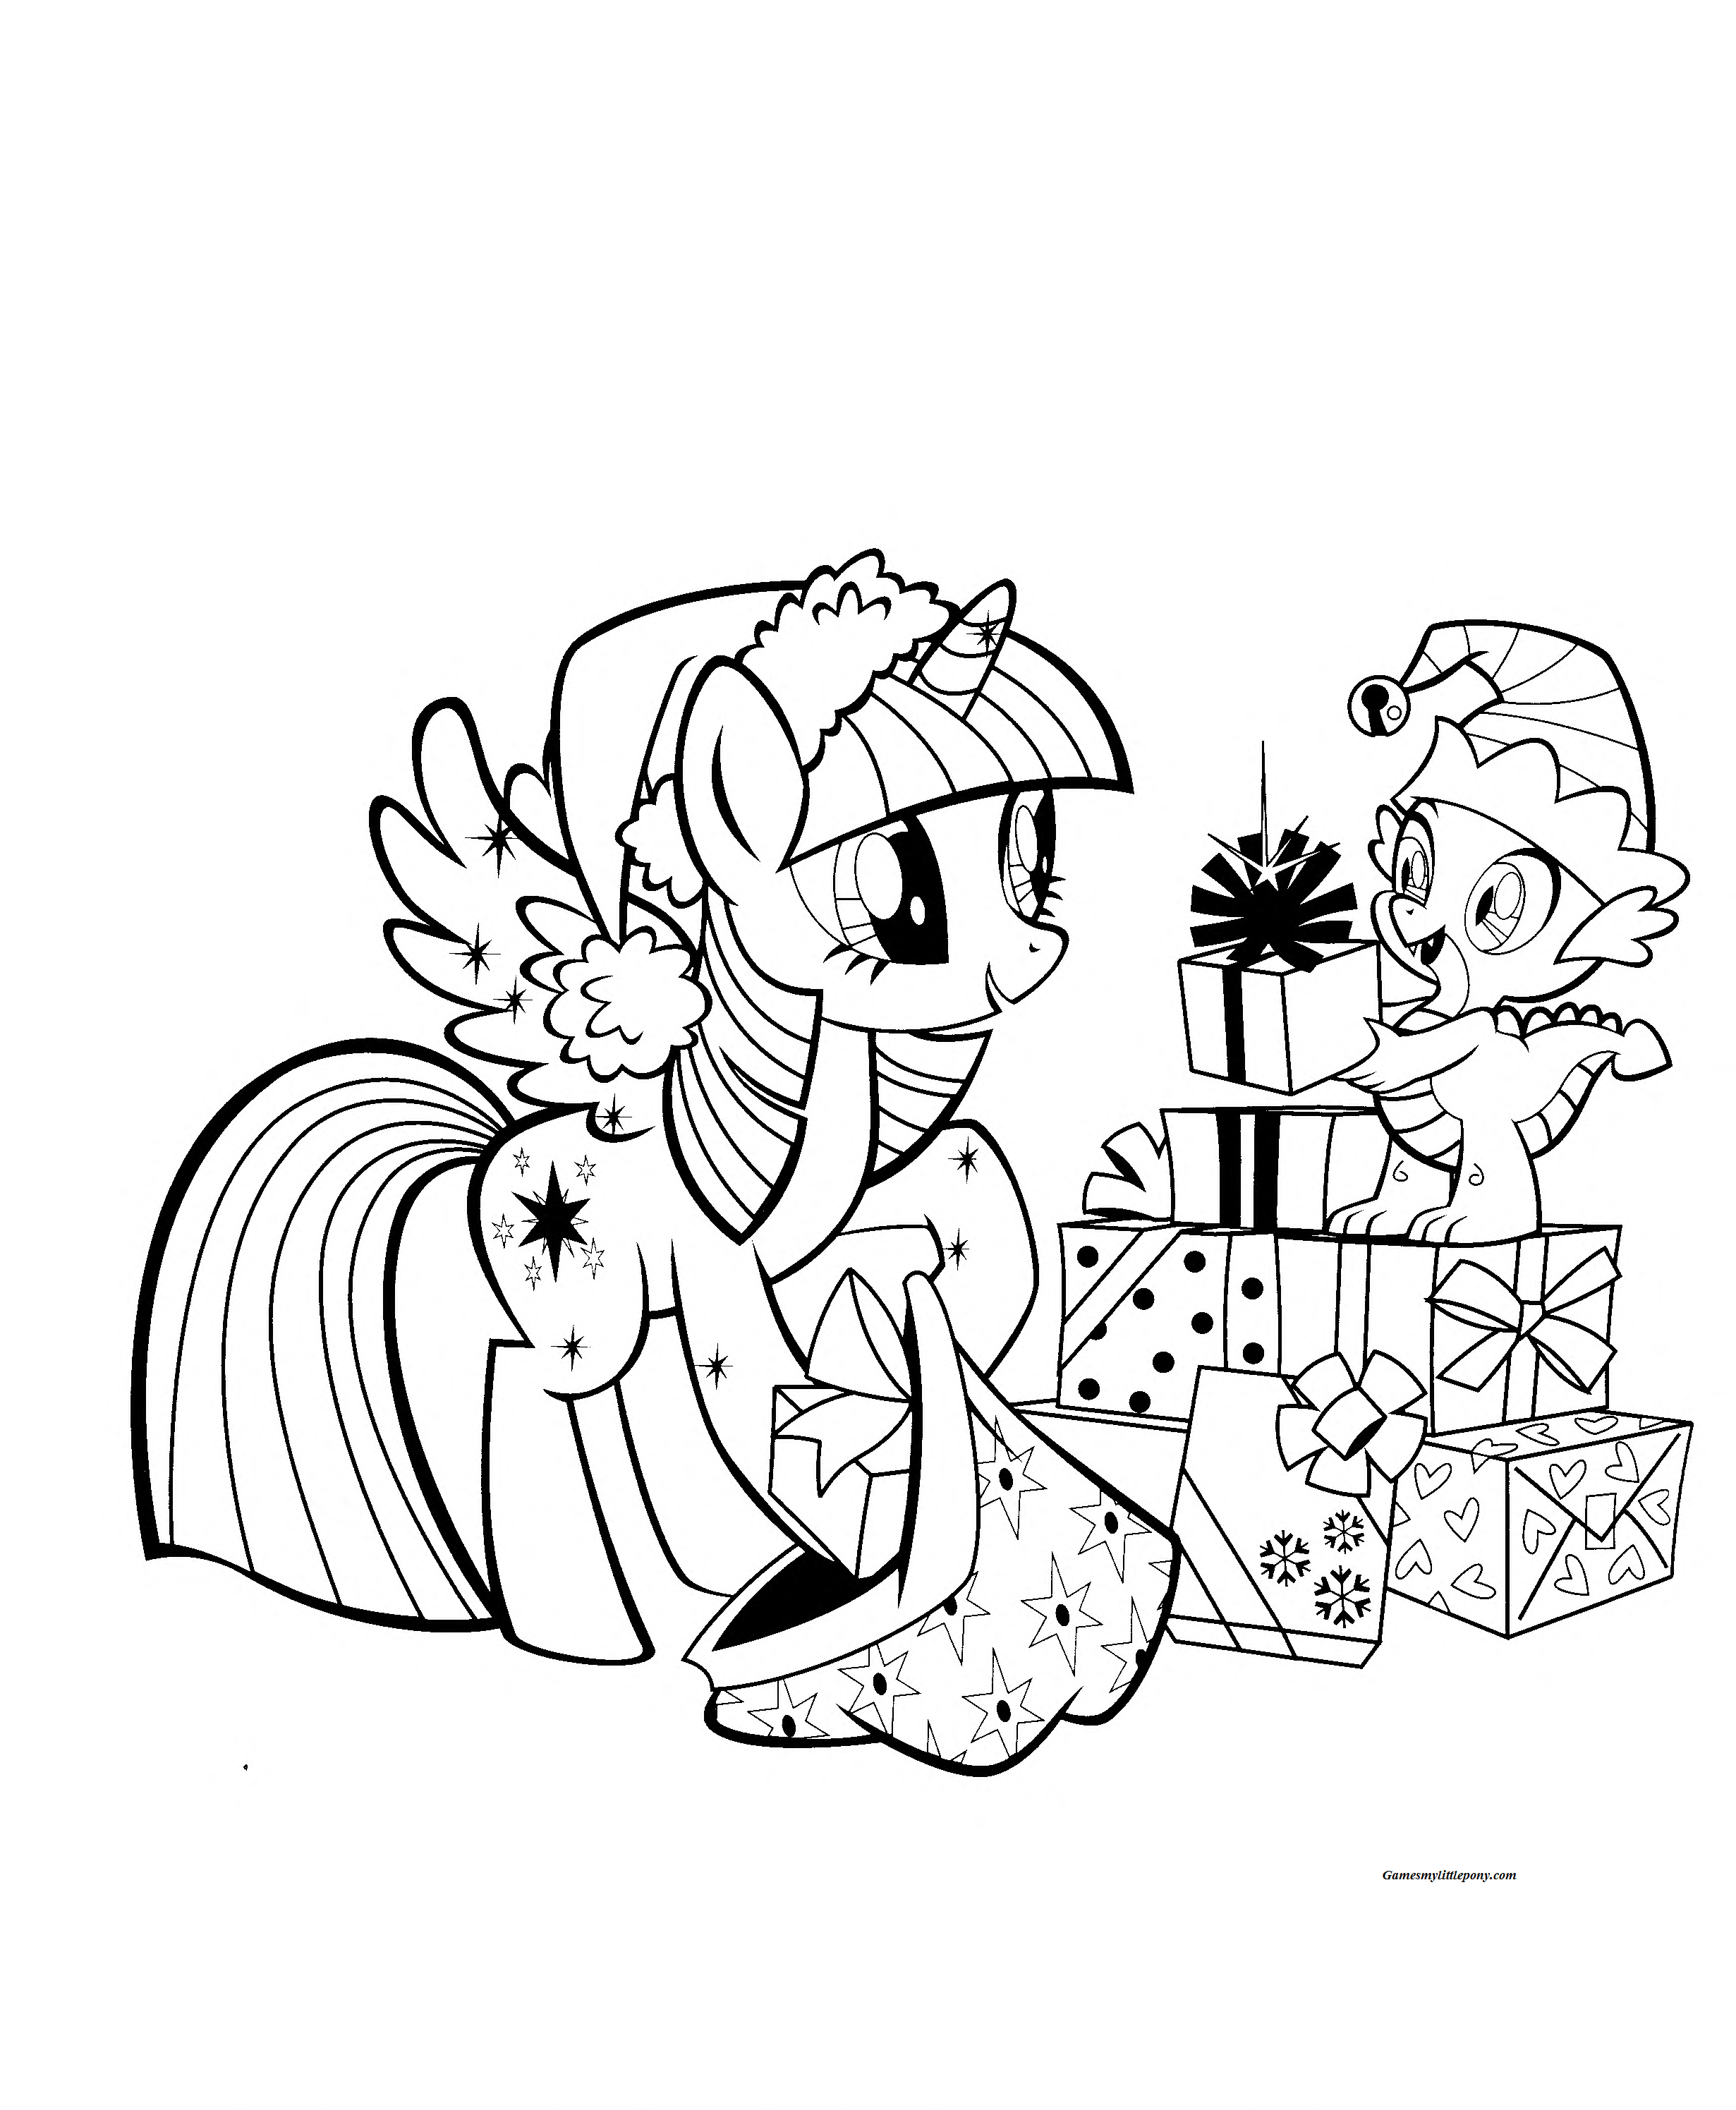 Twilight Sparkle Christmas My Little Pony Coloring Horse Coloring Pages My Little Pony Movie